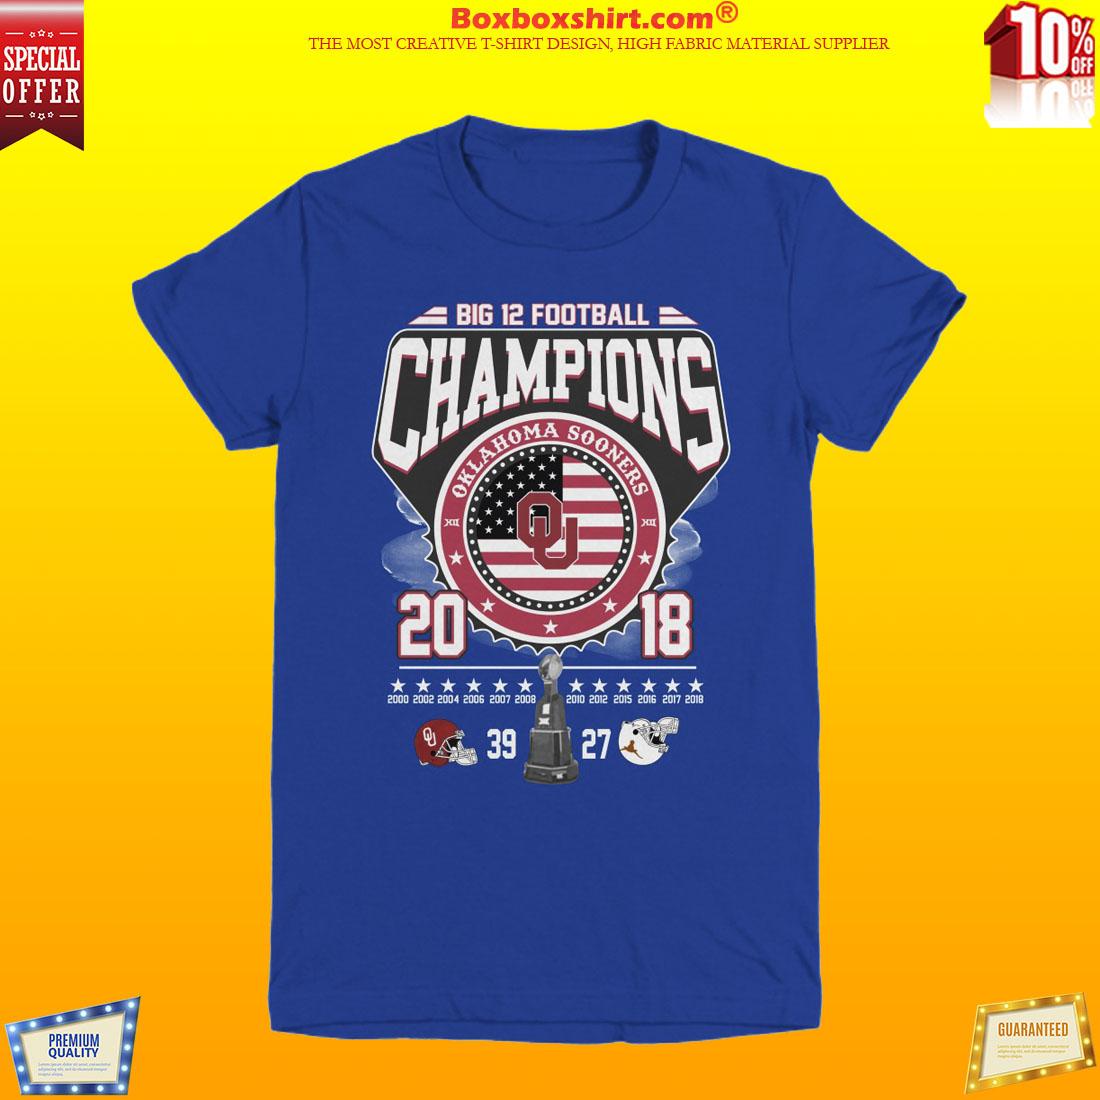 Oklahoma vs Texas big 12 football champion 2018 shirt